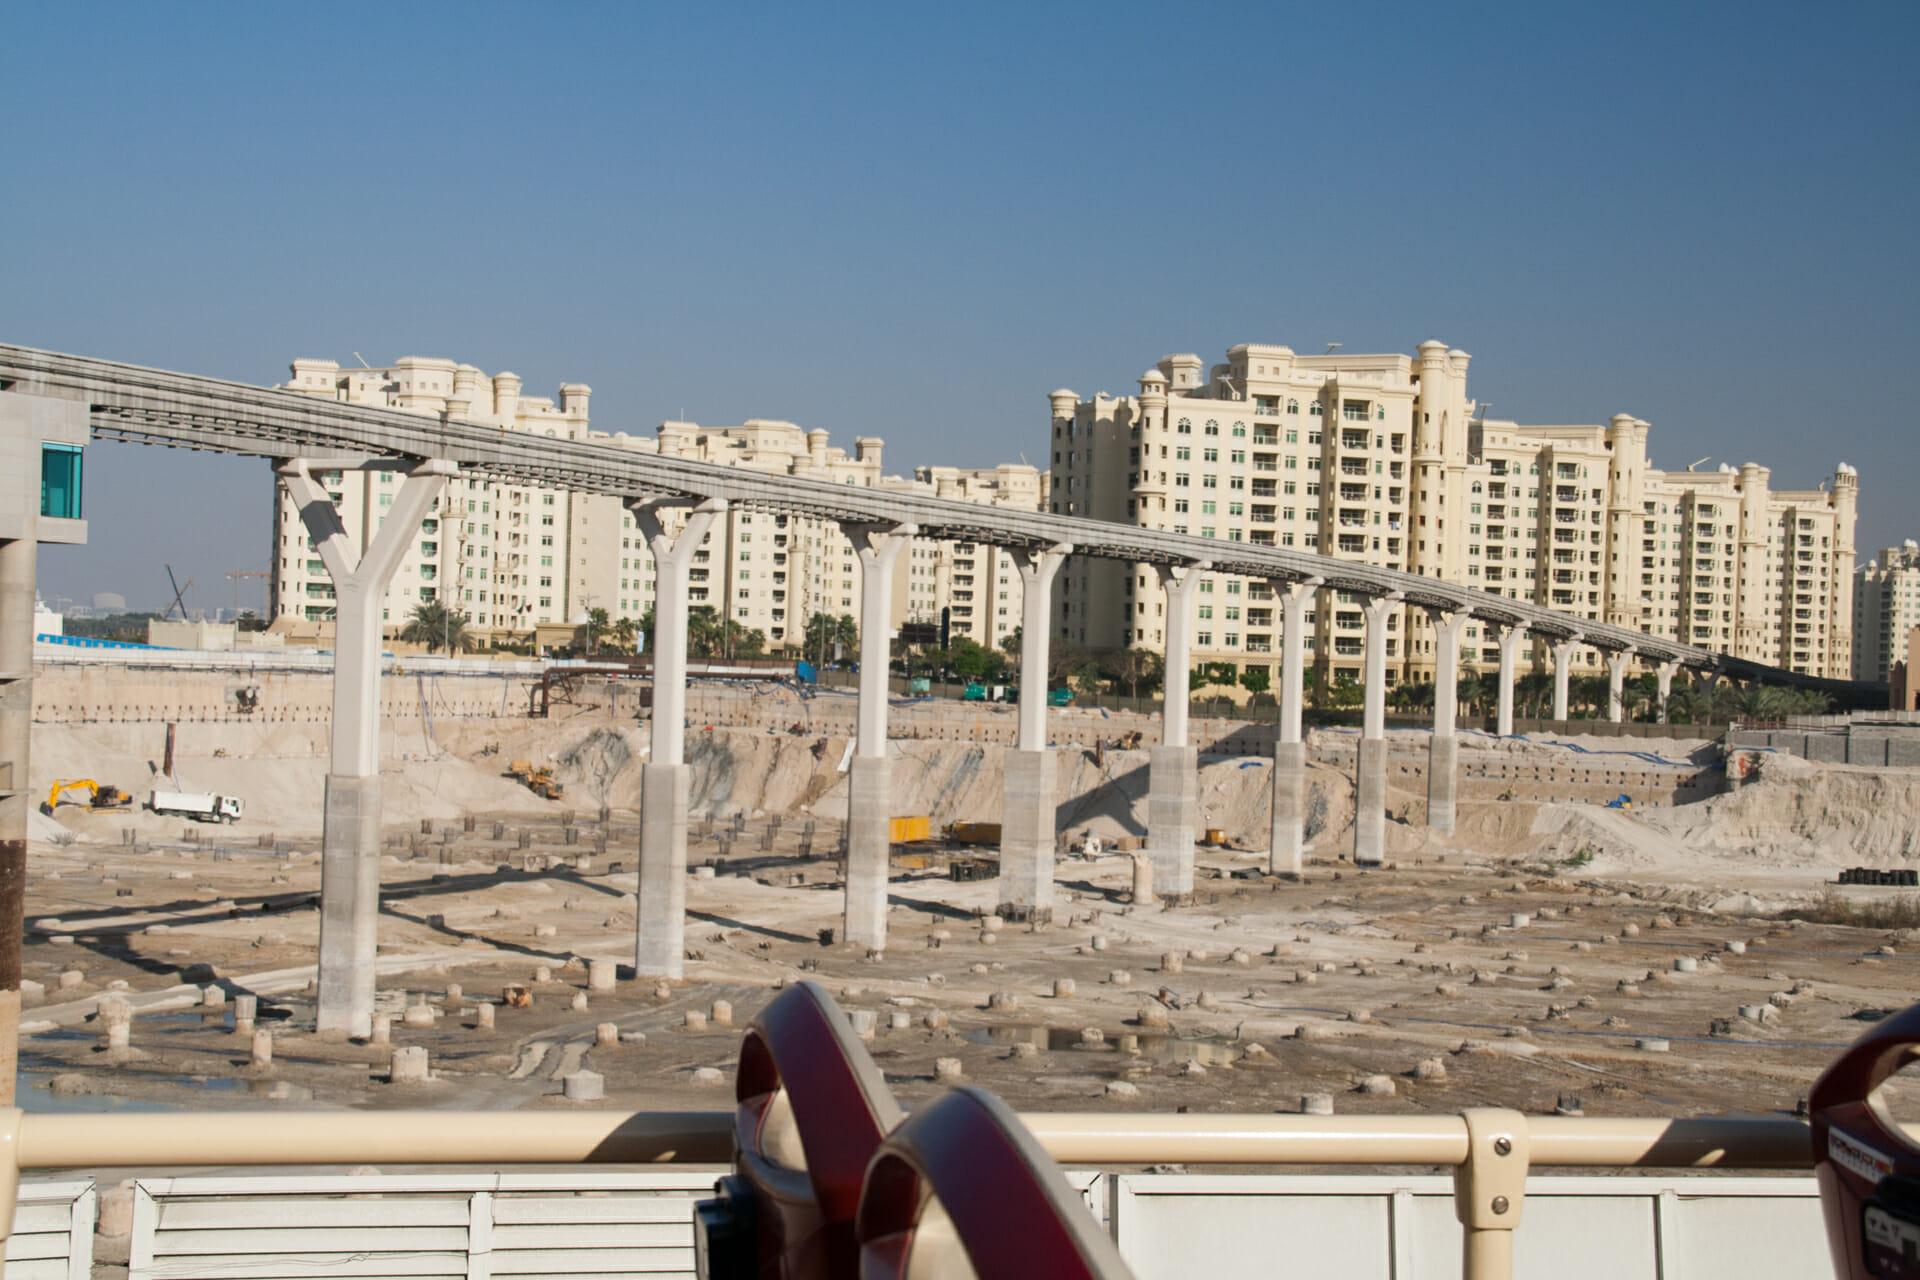 Dubai The Palm Mall Construction